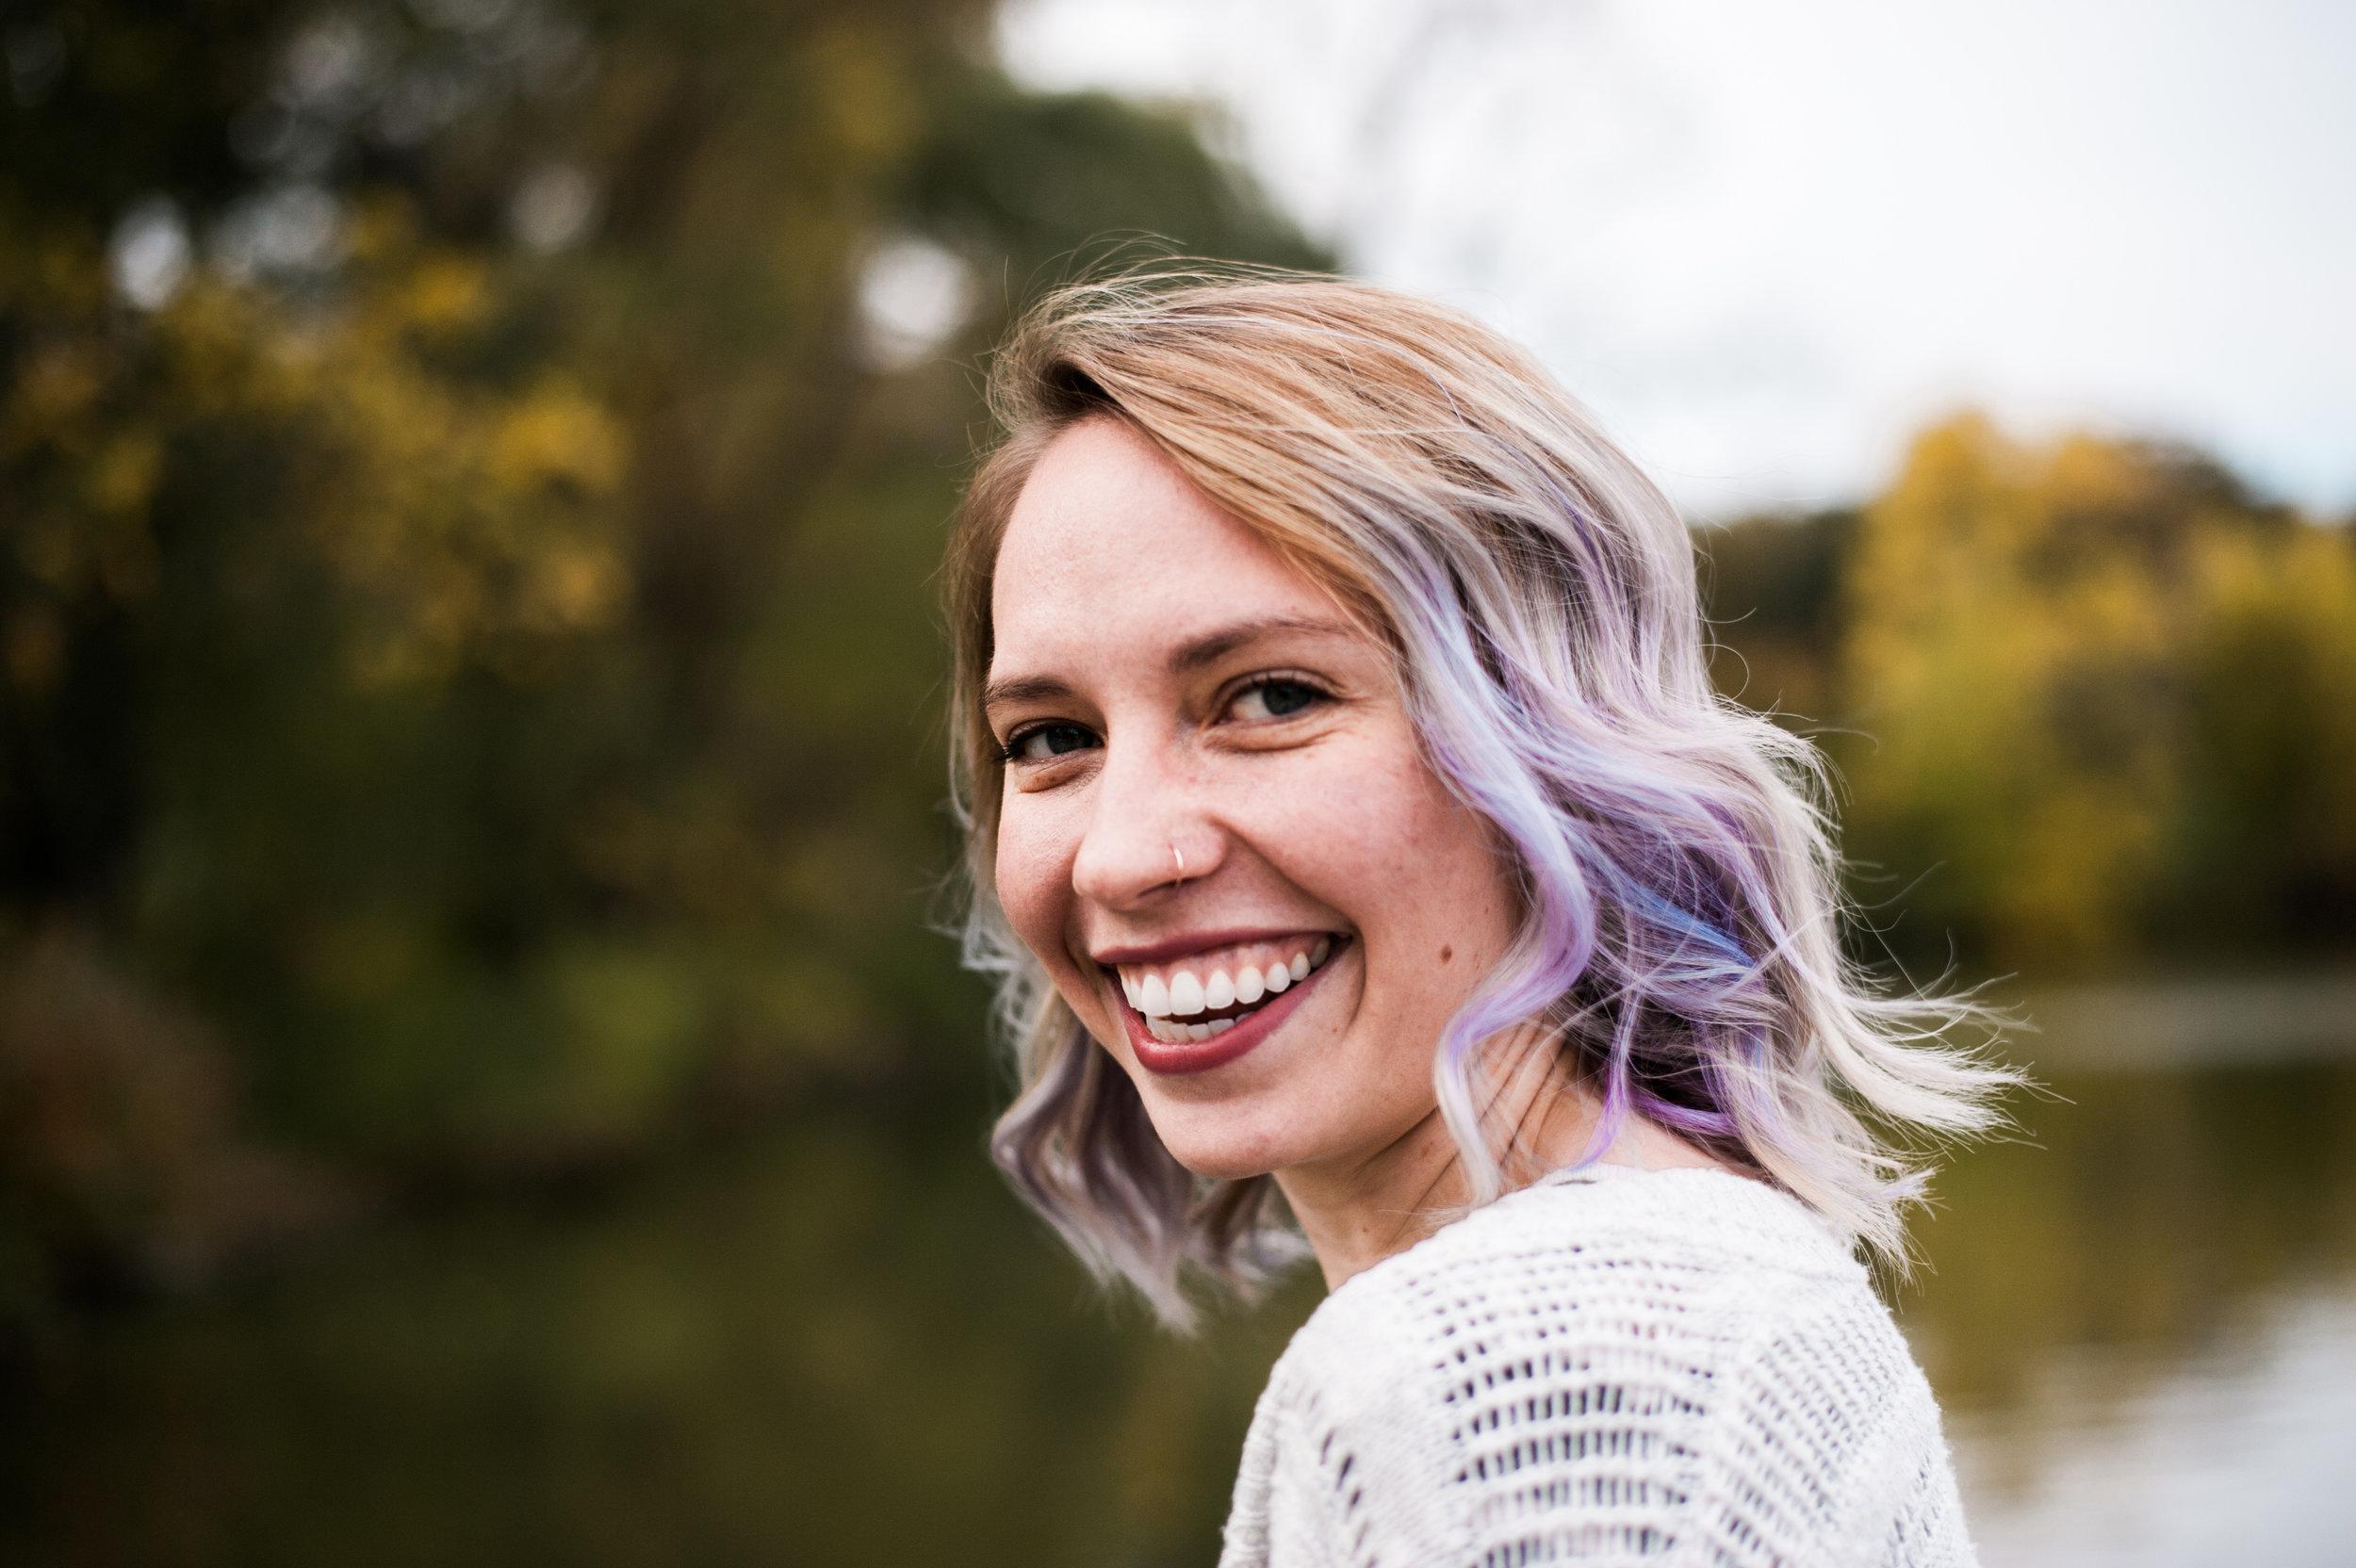 Photo of Emily by    Athena Feldshon   .